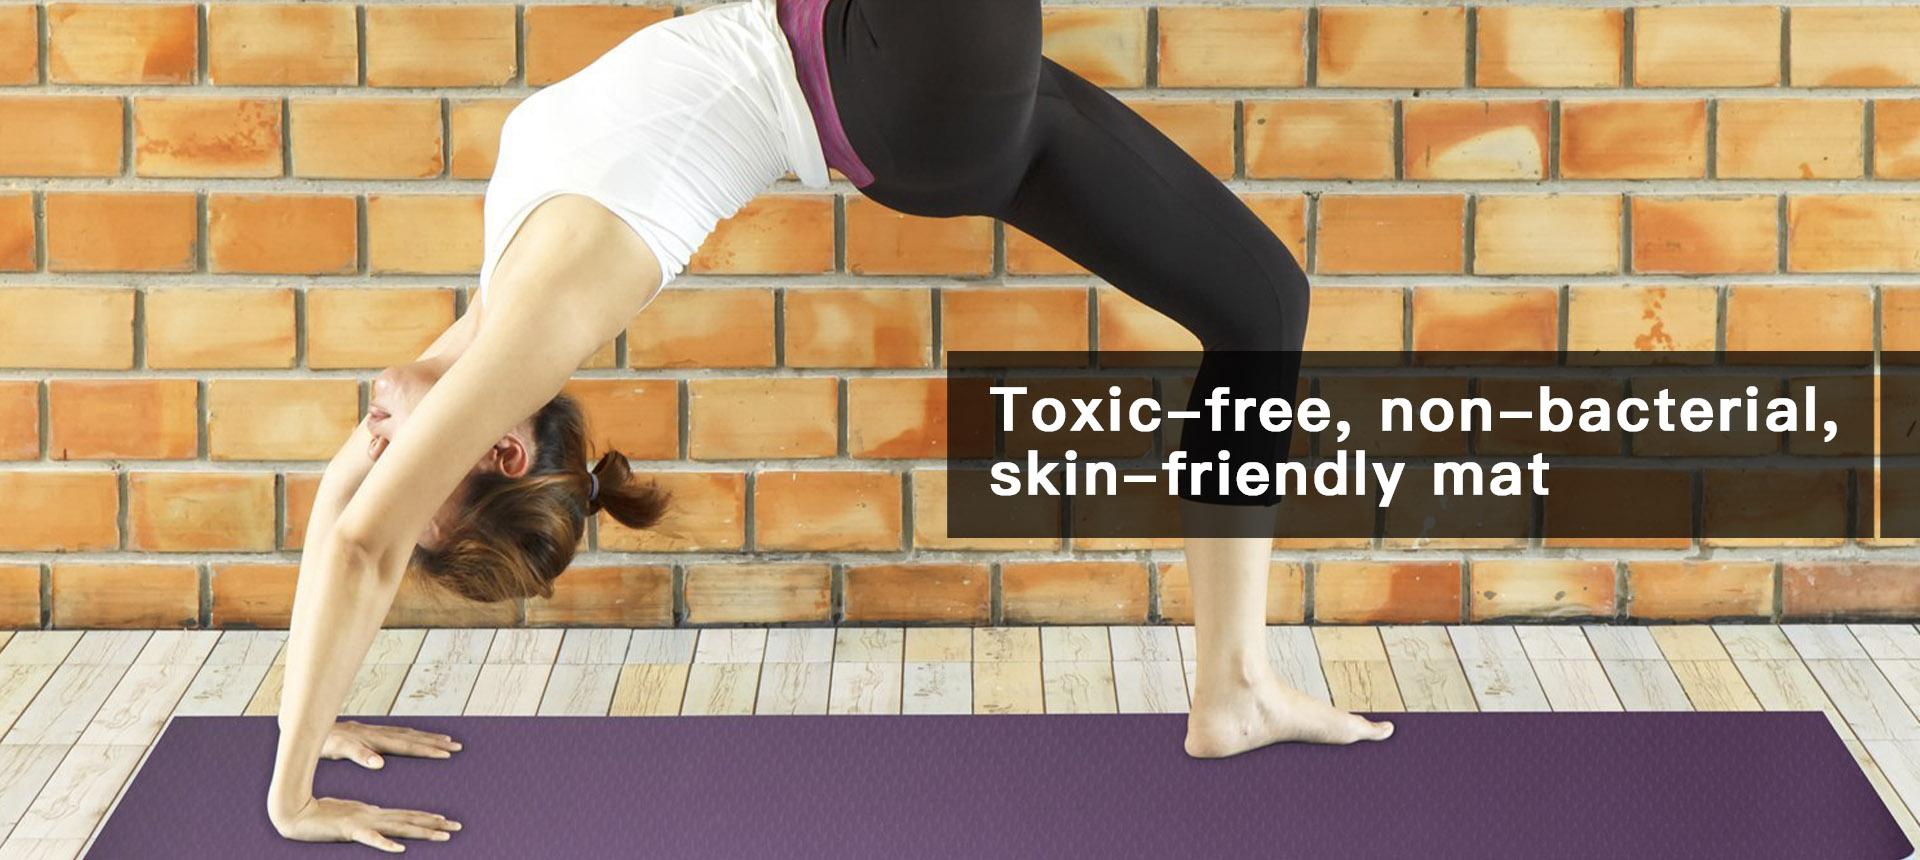 Anti-bacterial High-tech yoga mat